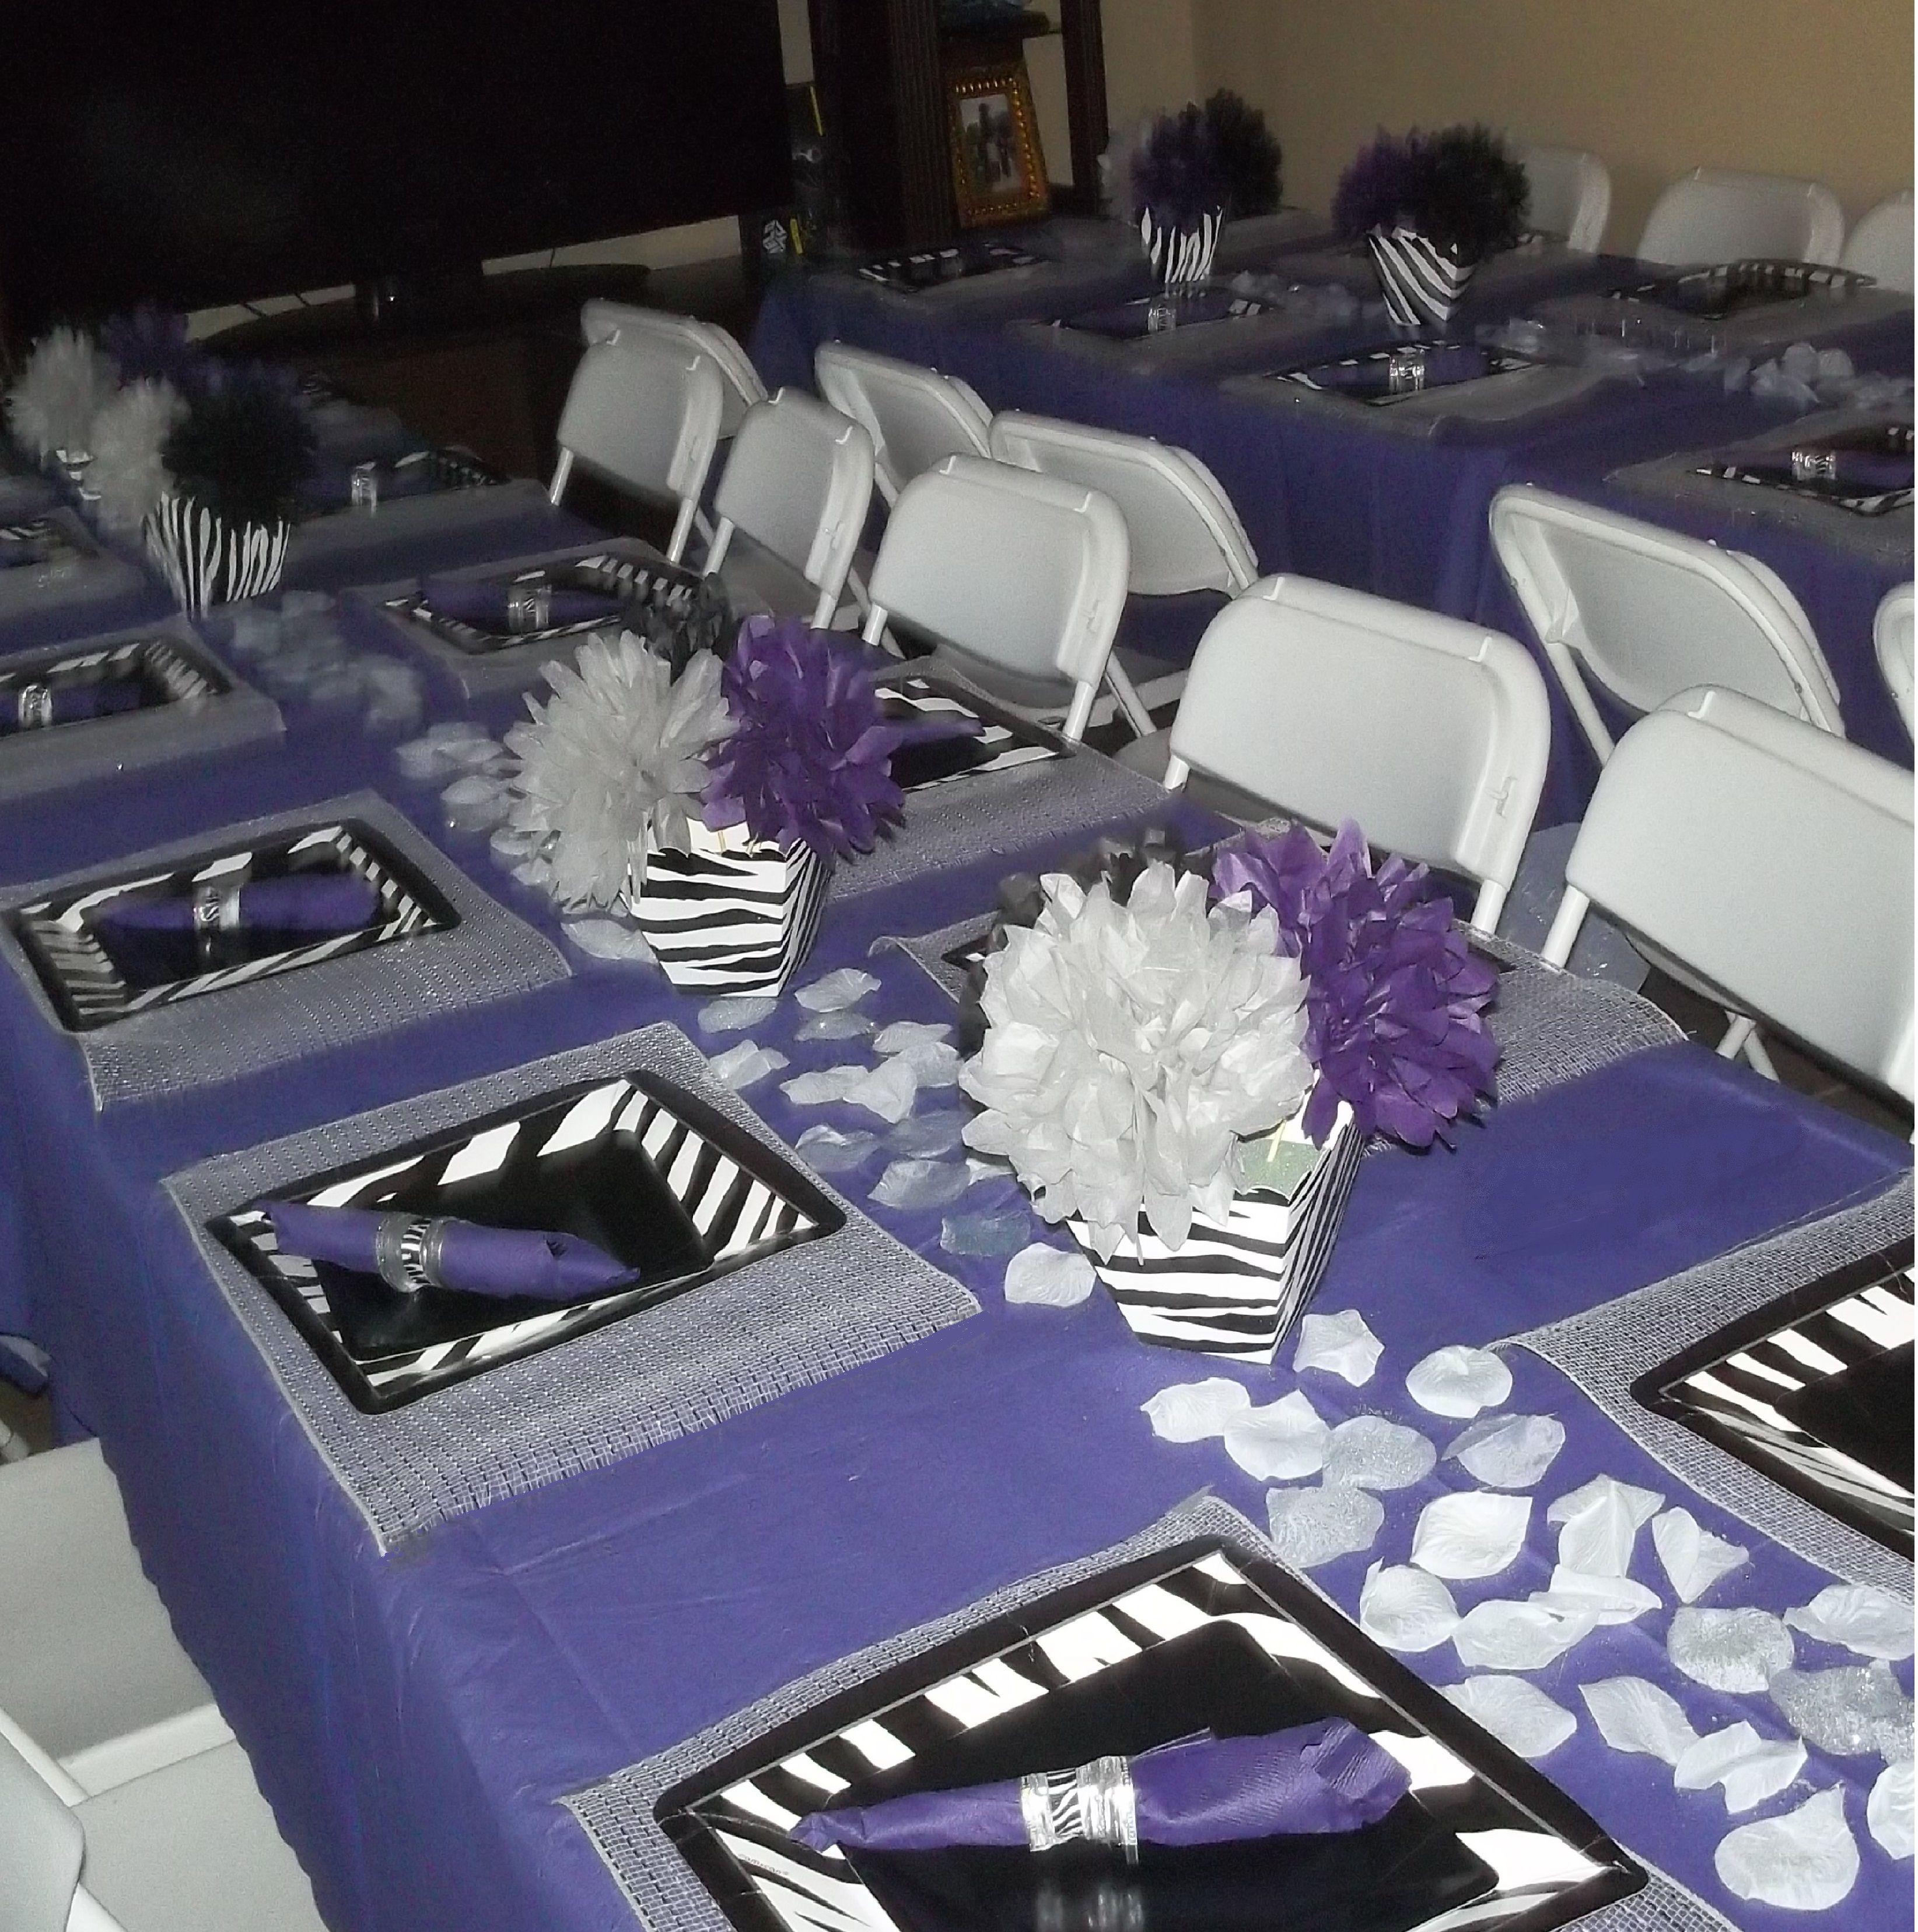 Zebra print wedding ideas wedding ideas and themes pinterest zebra print wedding ideas junglespirit Images